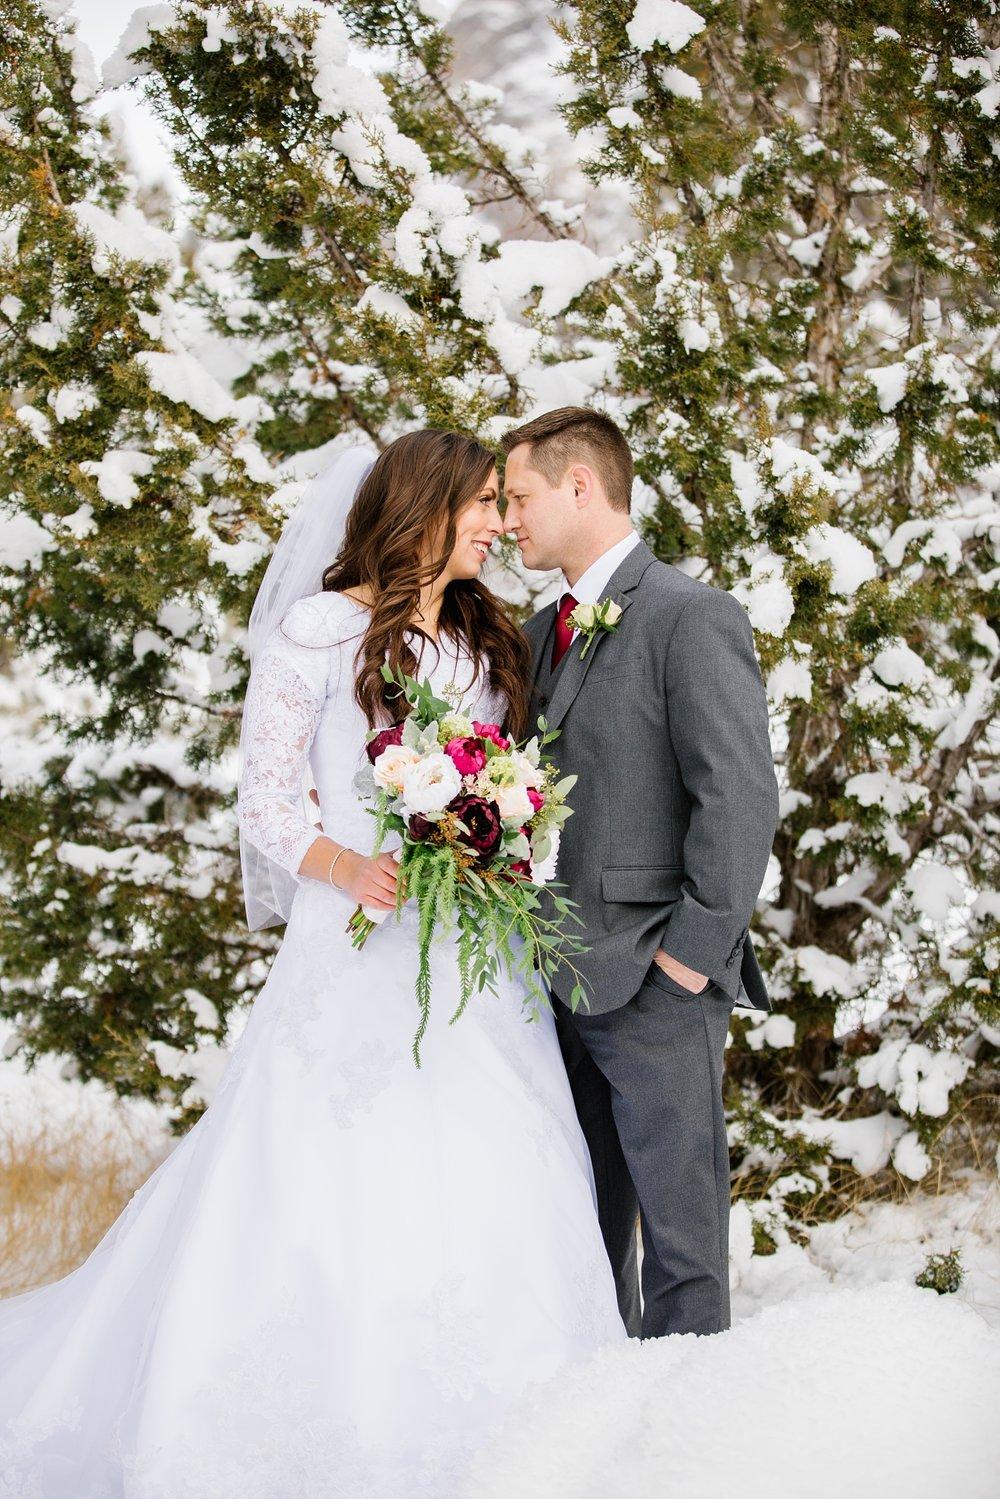 SSBridals-51_Lizzie-B-Imagery-Utah-Wedding-Photographer-Logan-Temple-Logan-Canyon-Mountain-Horse-Session.jpg